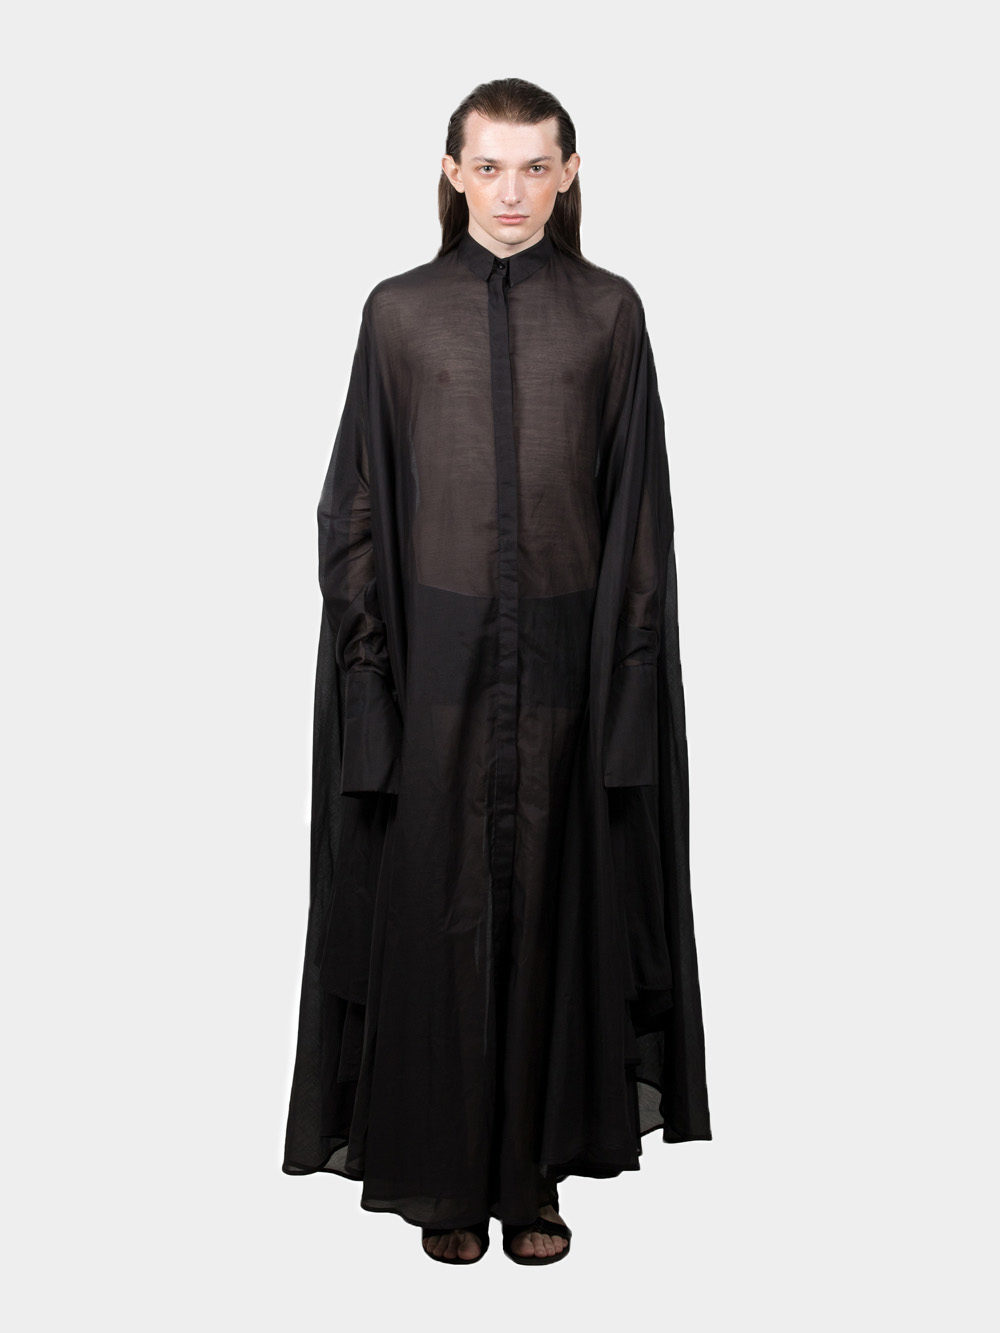 Ludus Transparent Medusae Shirt - black